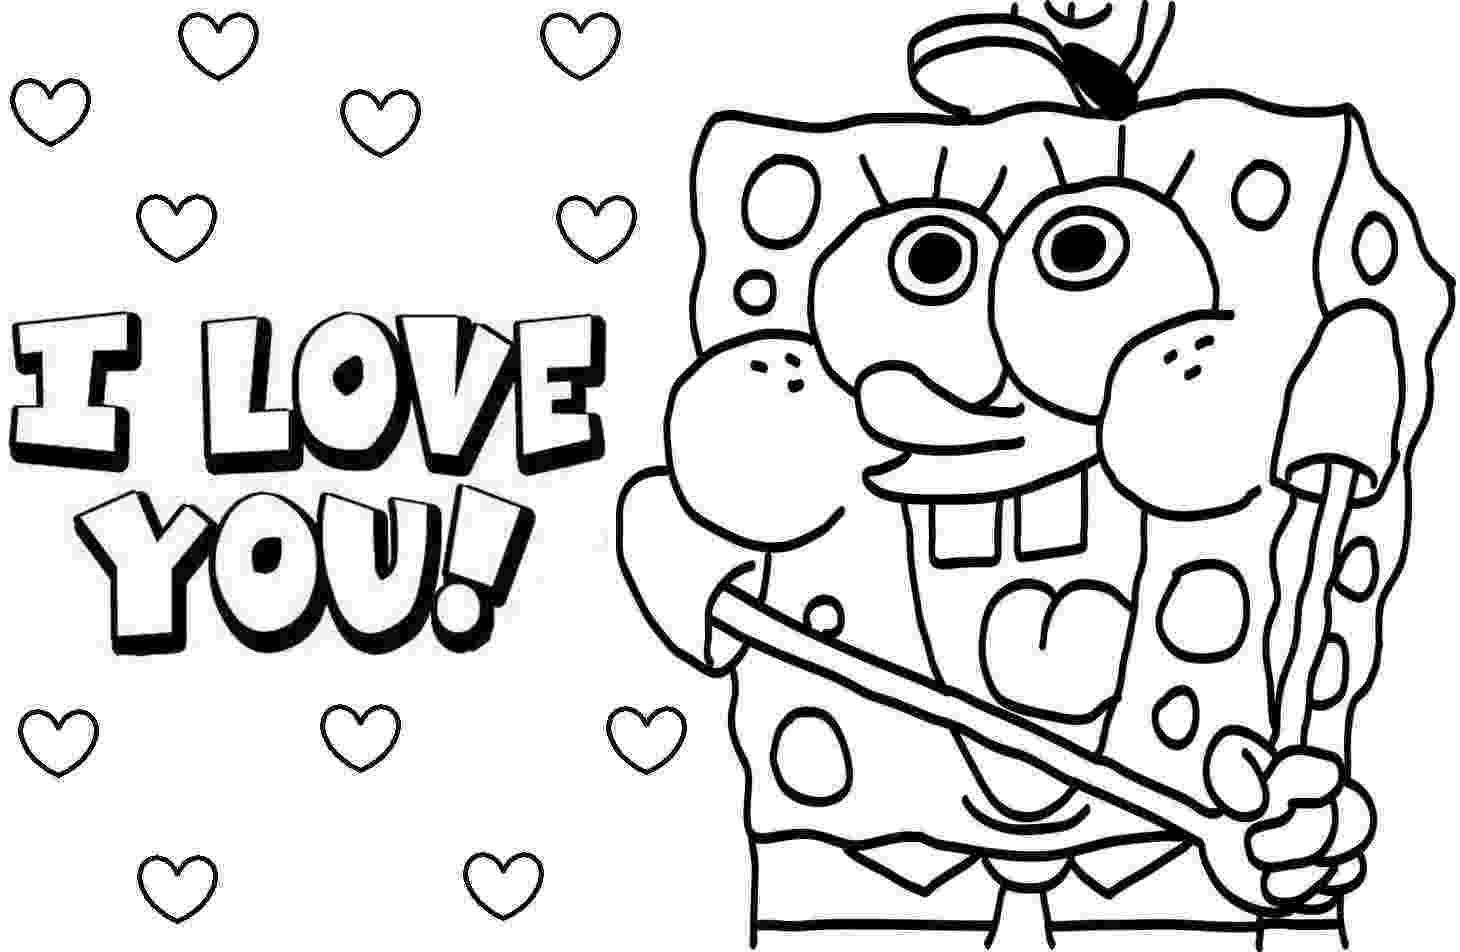 free coloring pages spongebob free printable spongebob squarepants coloring pages for kids coloring pages spongebob free